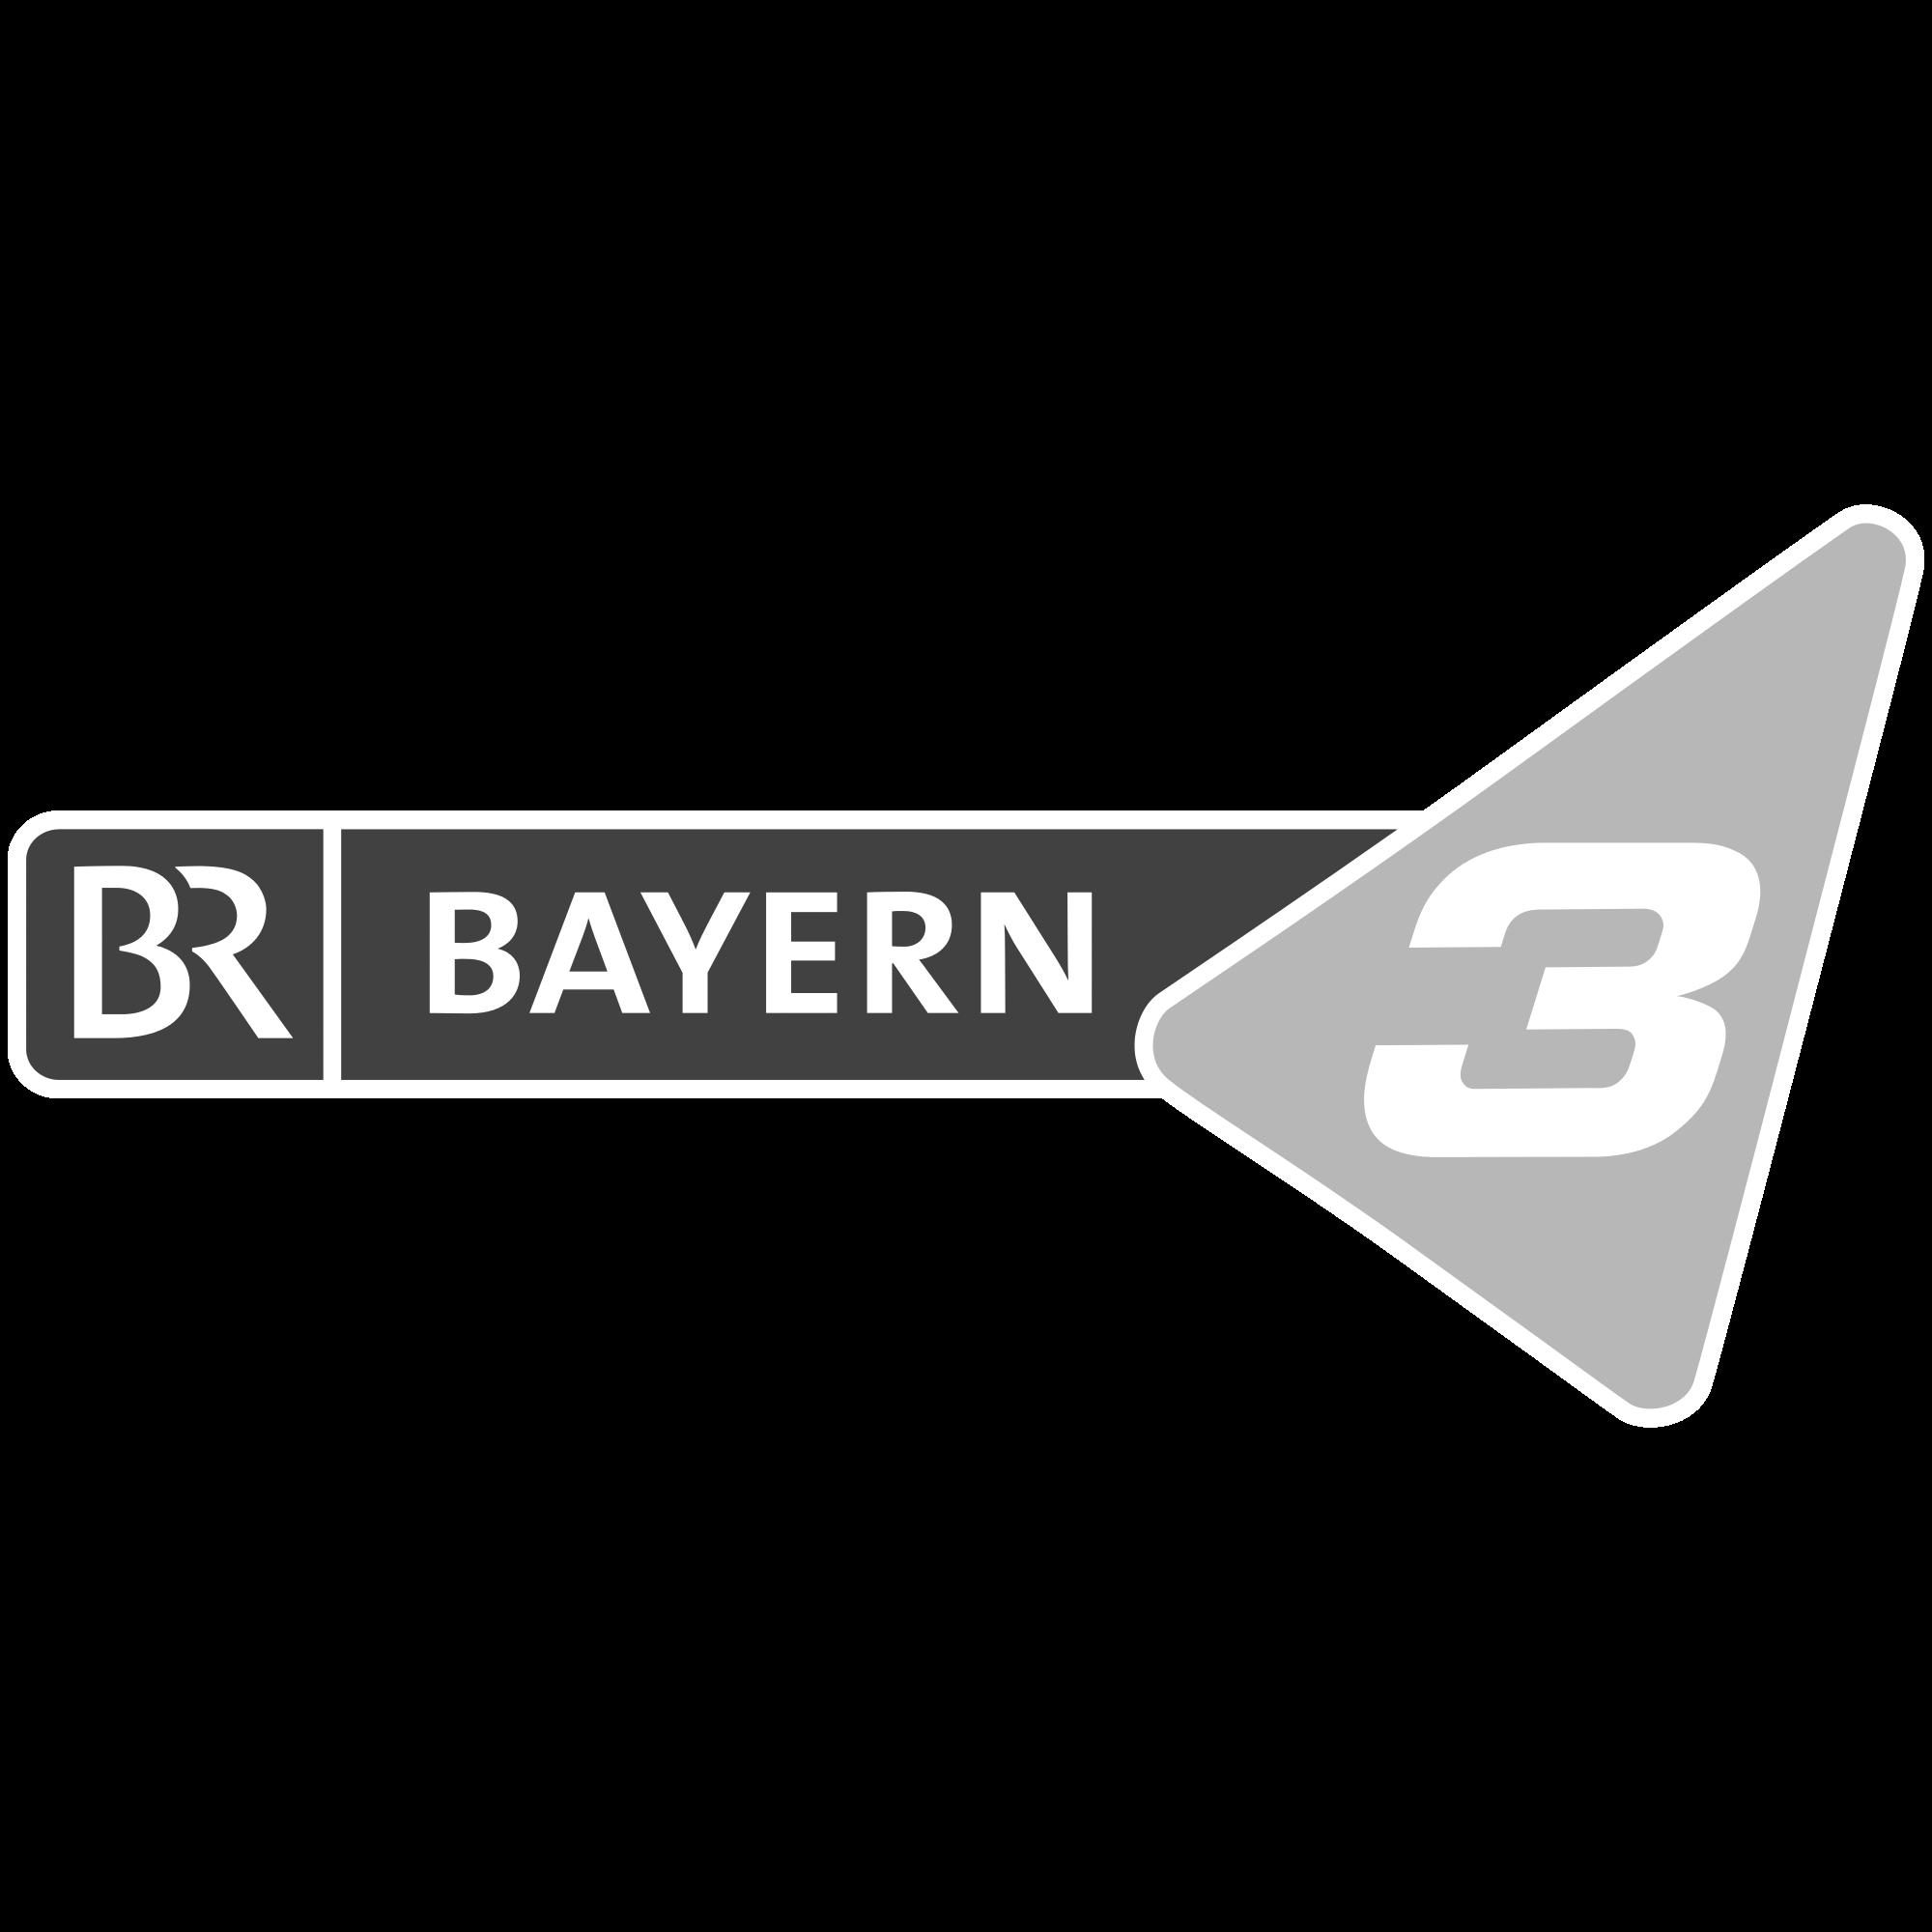 bayern3-logo-grau